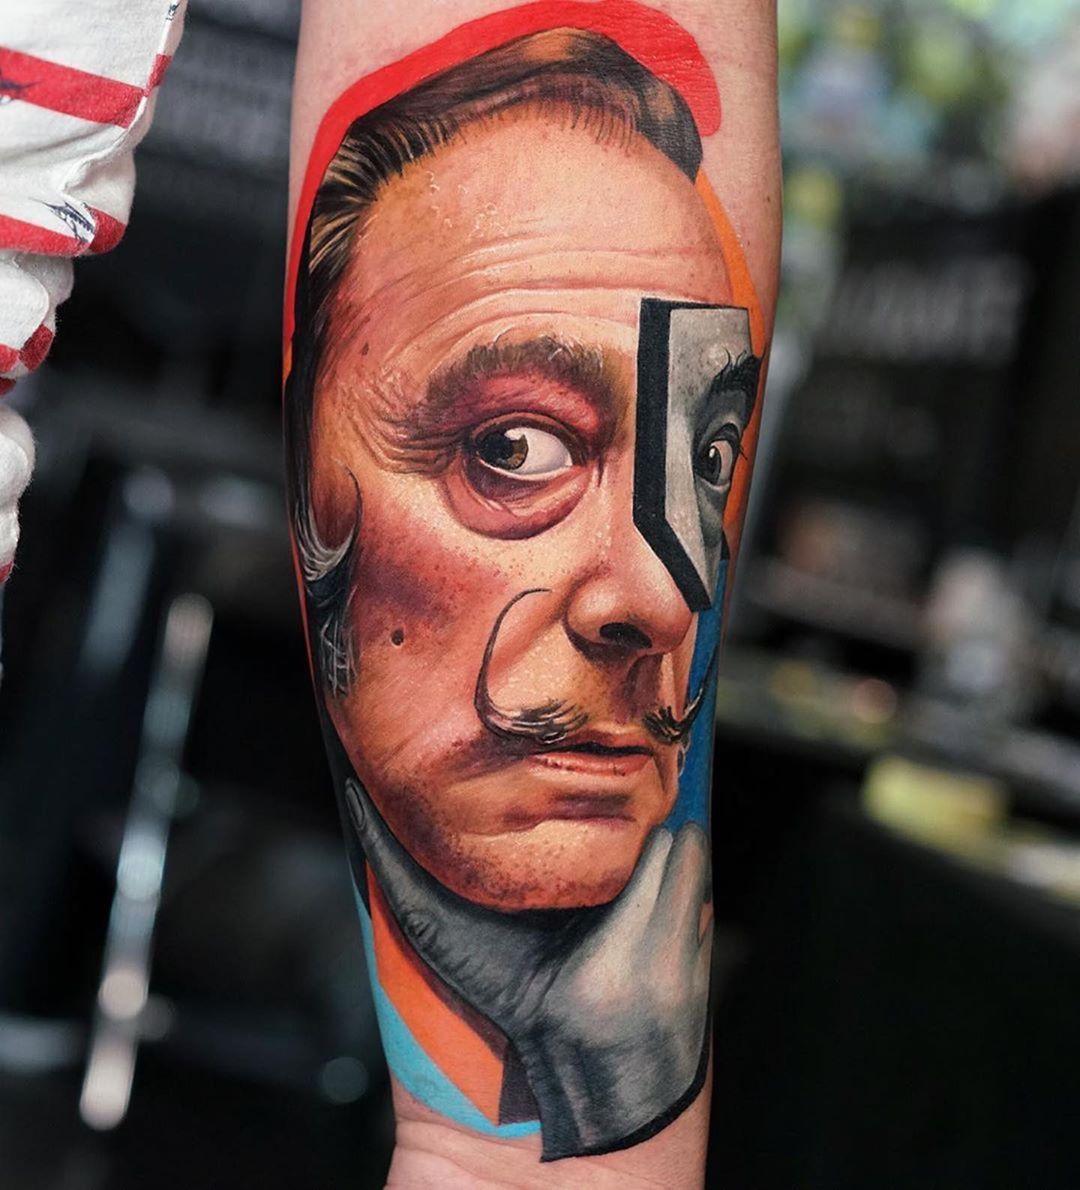 Artist davepaulo_tattooartist inkallday inkedgirls